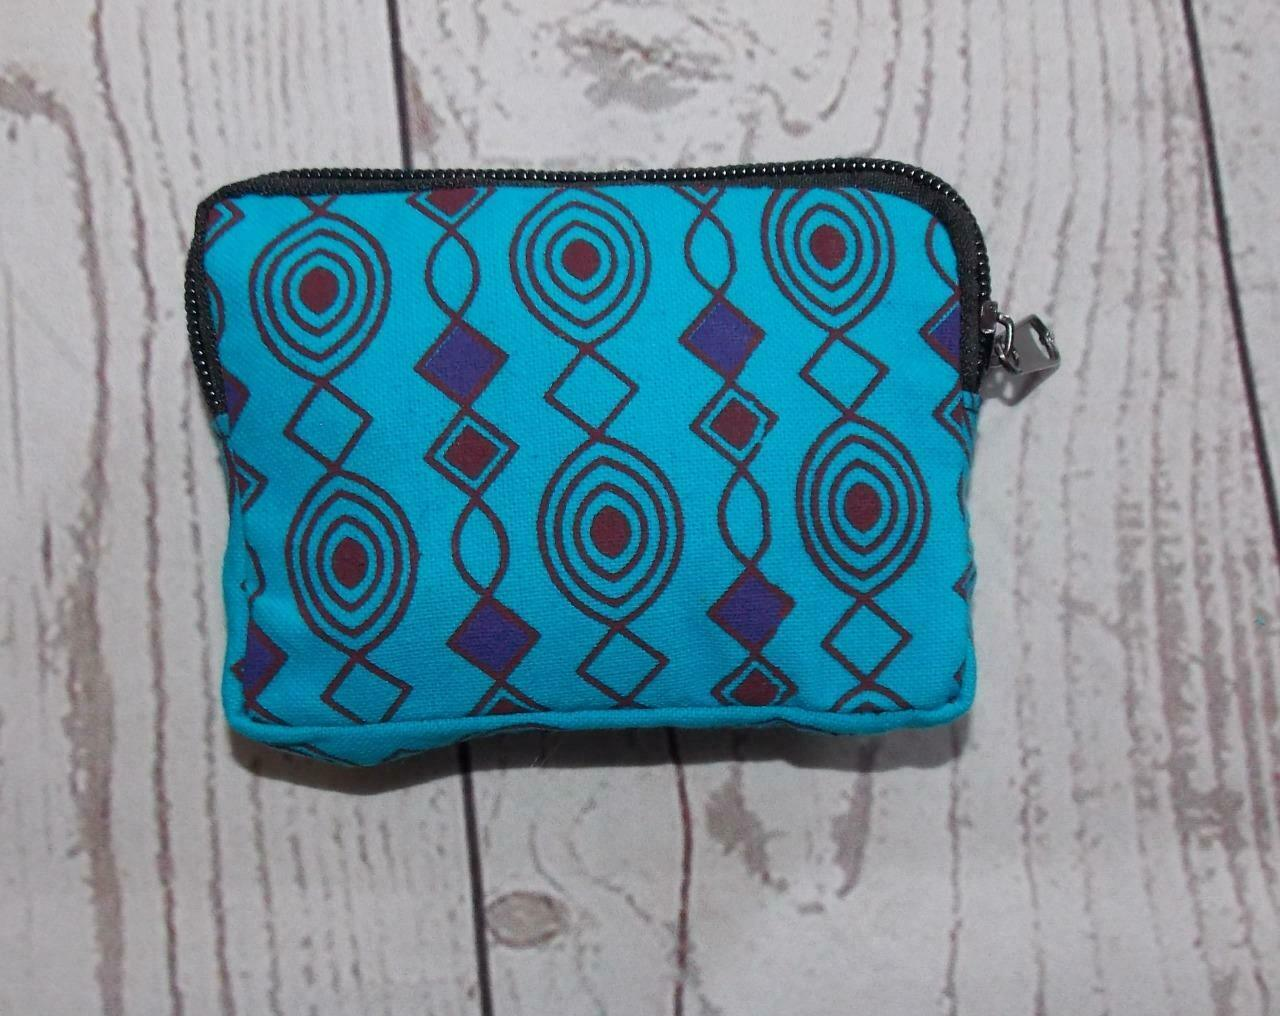 Fair Trade Ethnic Hippy Boho Multi-Coloured Cotton Wallet / Purse From Nepal